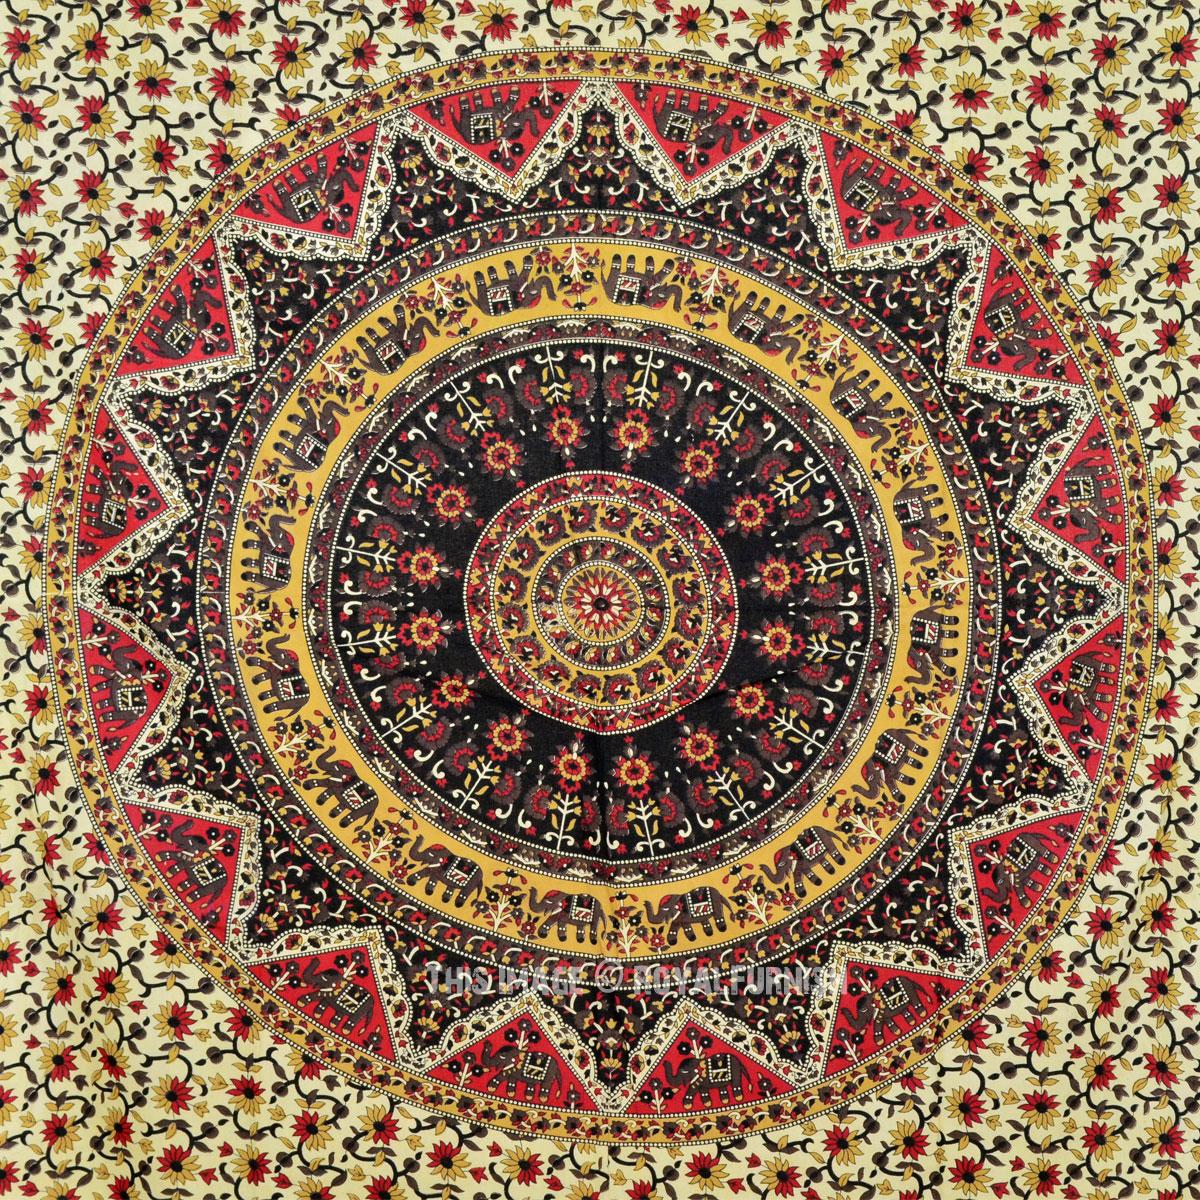 Beige and Red Kerala Star Mandala Wall Tapestry